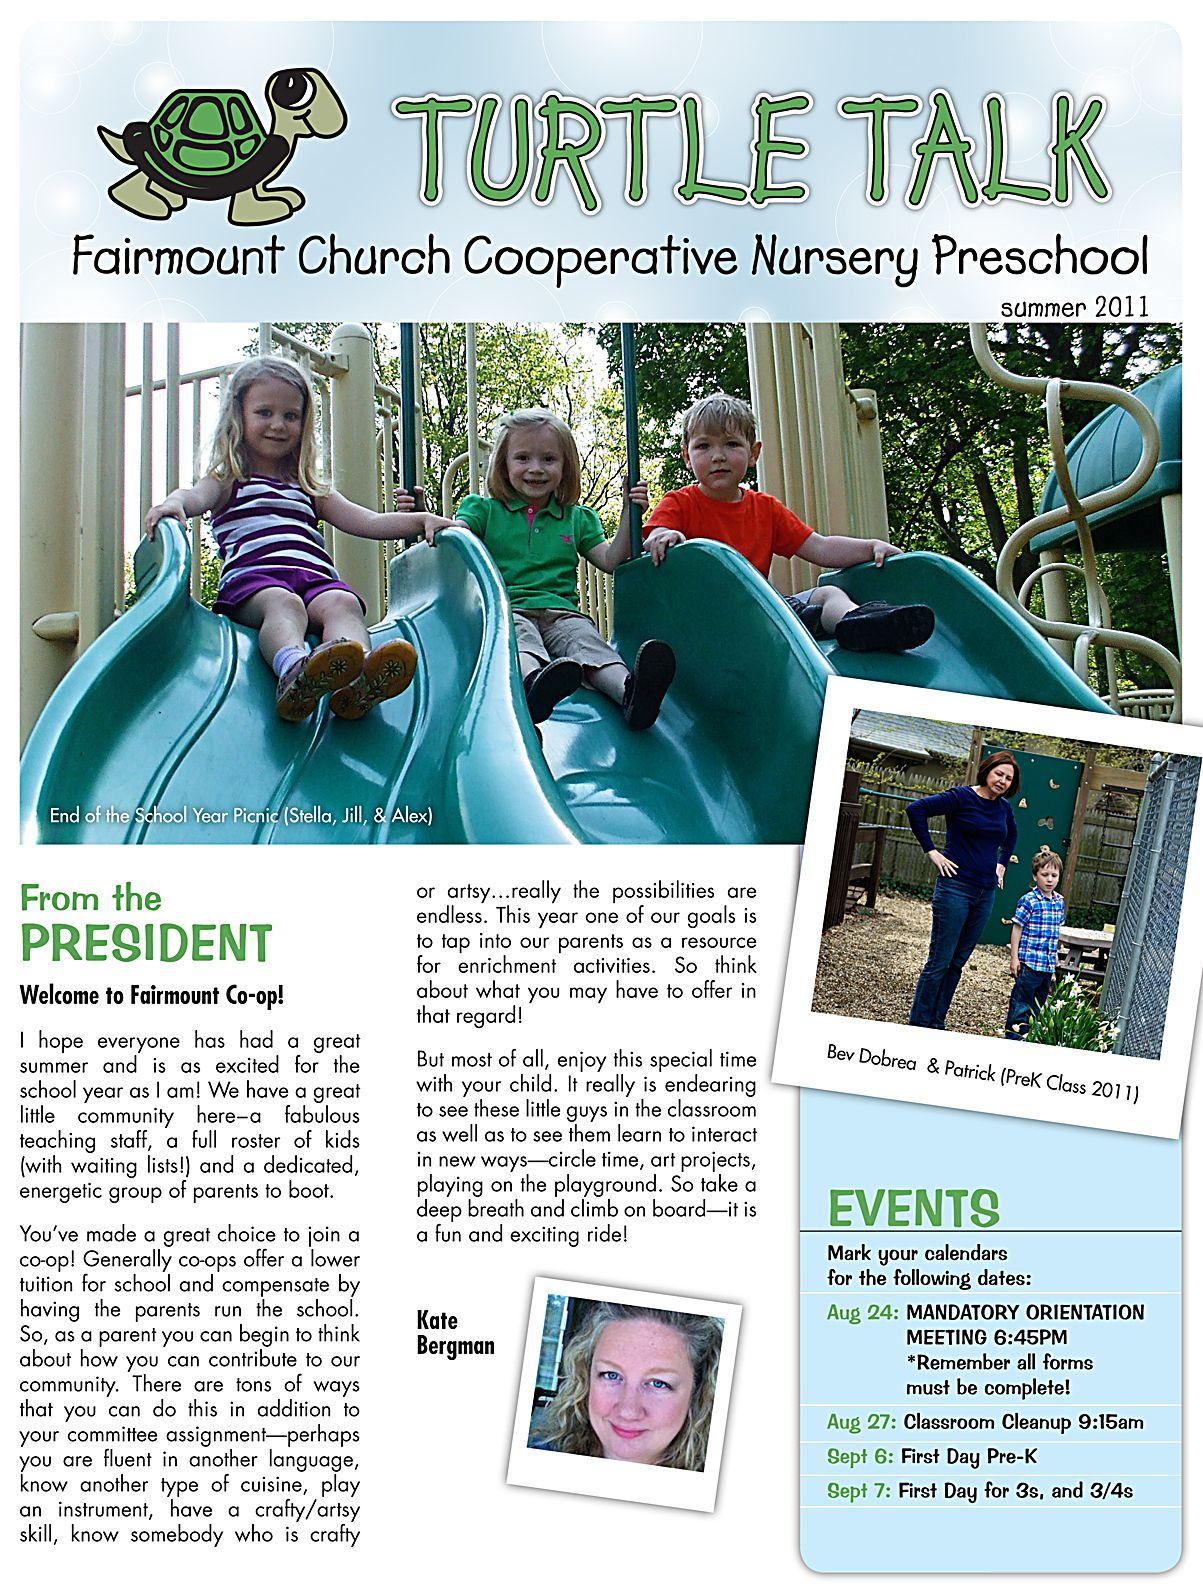 fairmount cooperative preschool fccns summer newsletter education